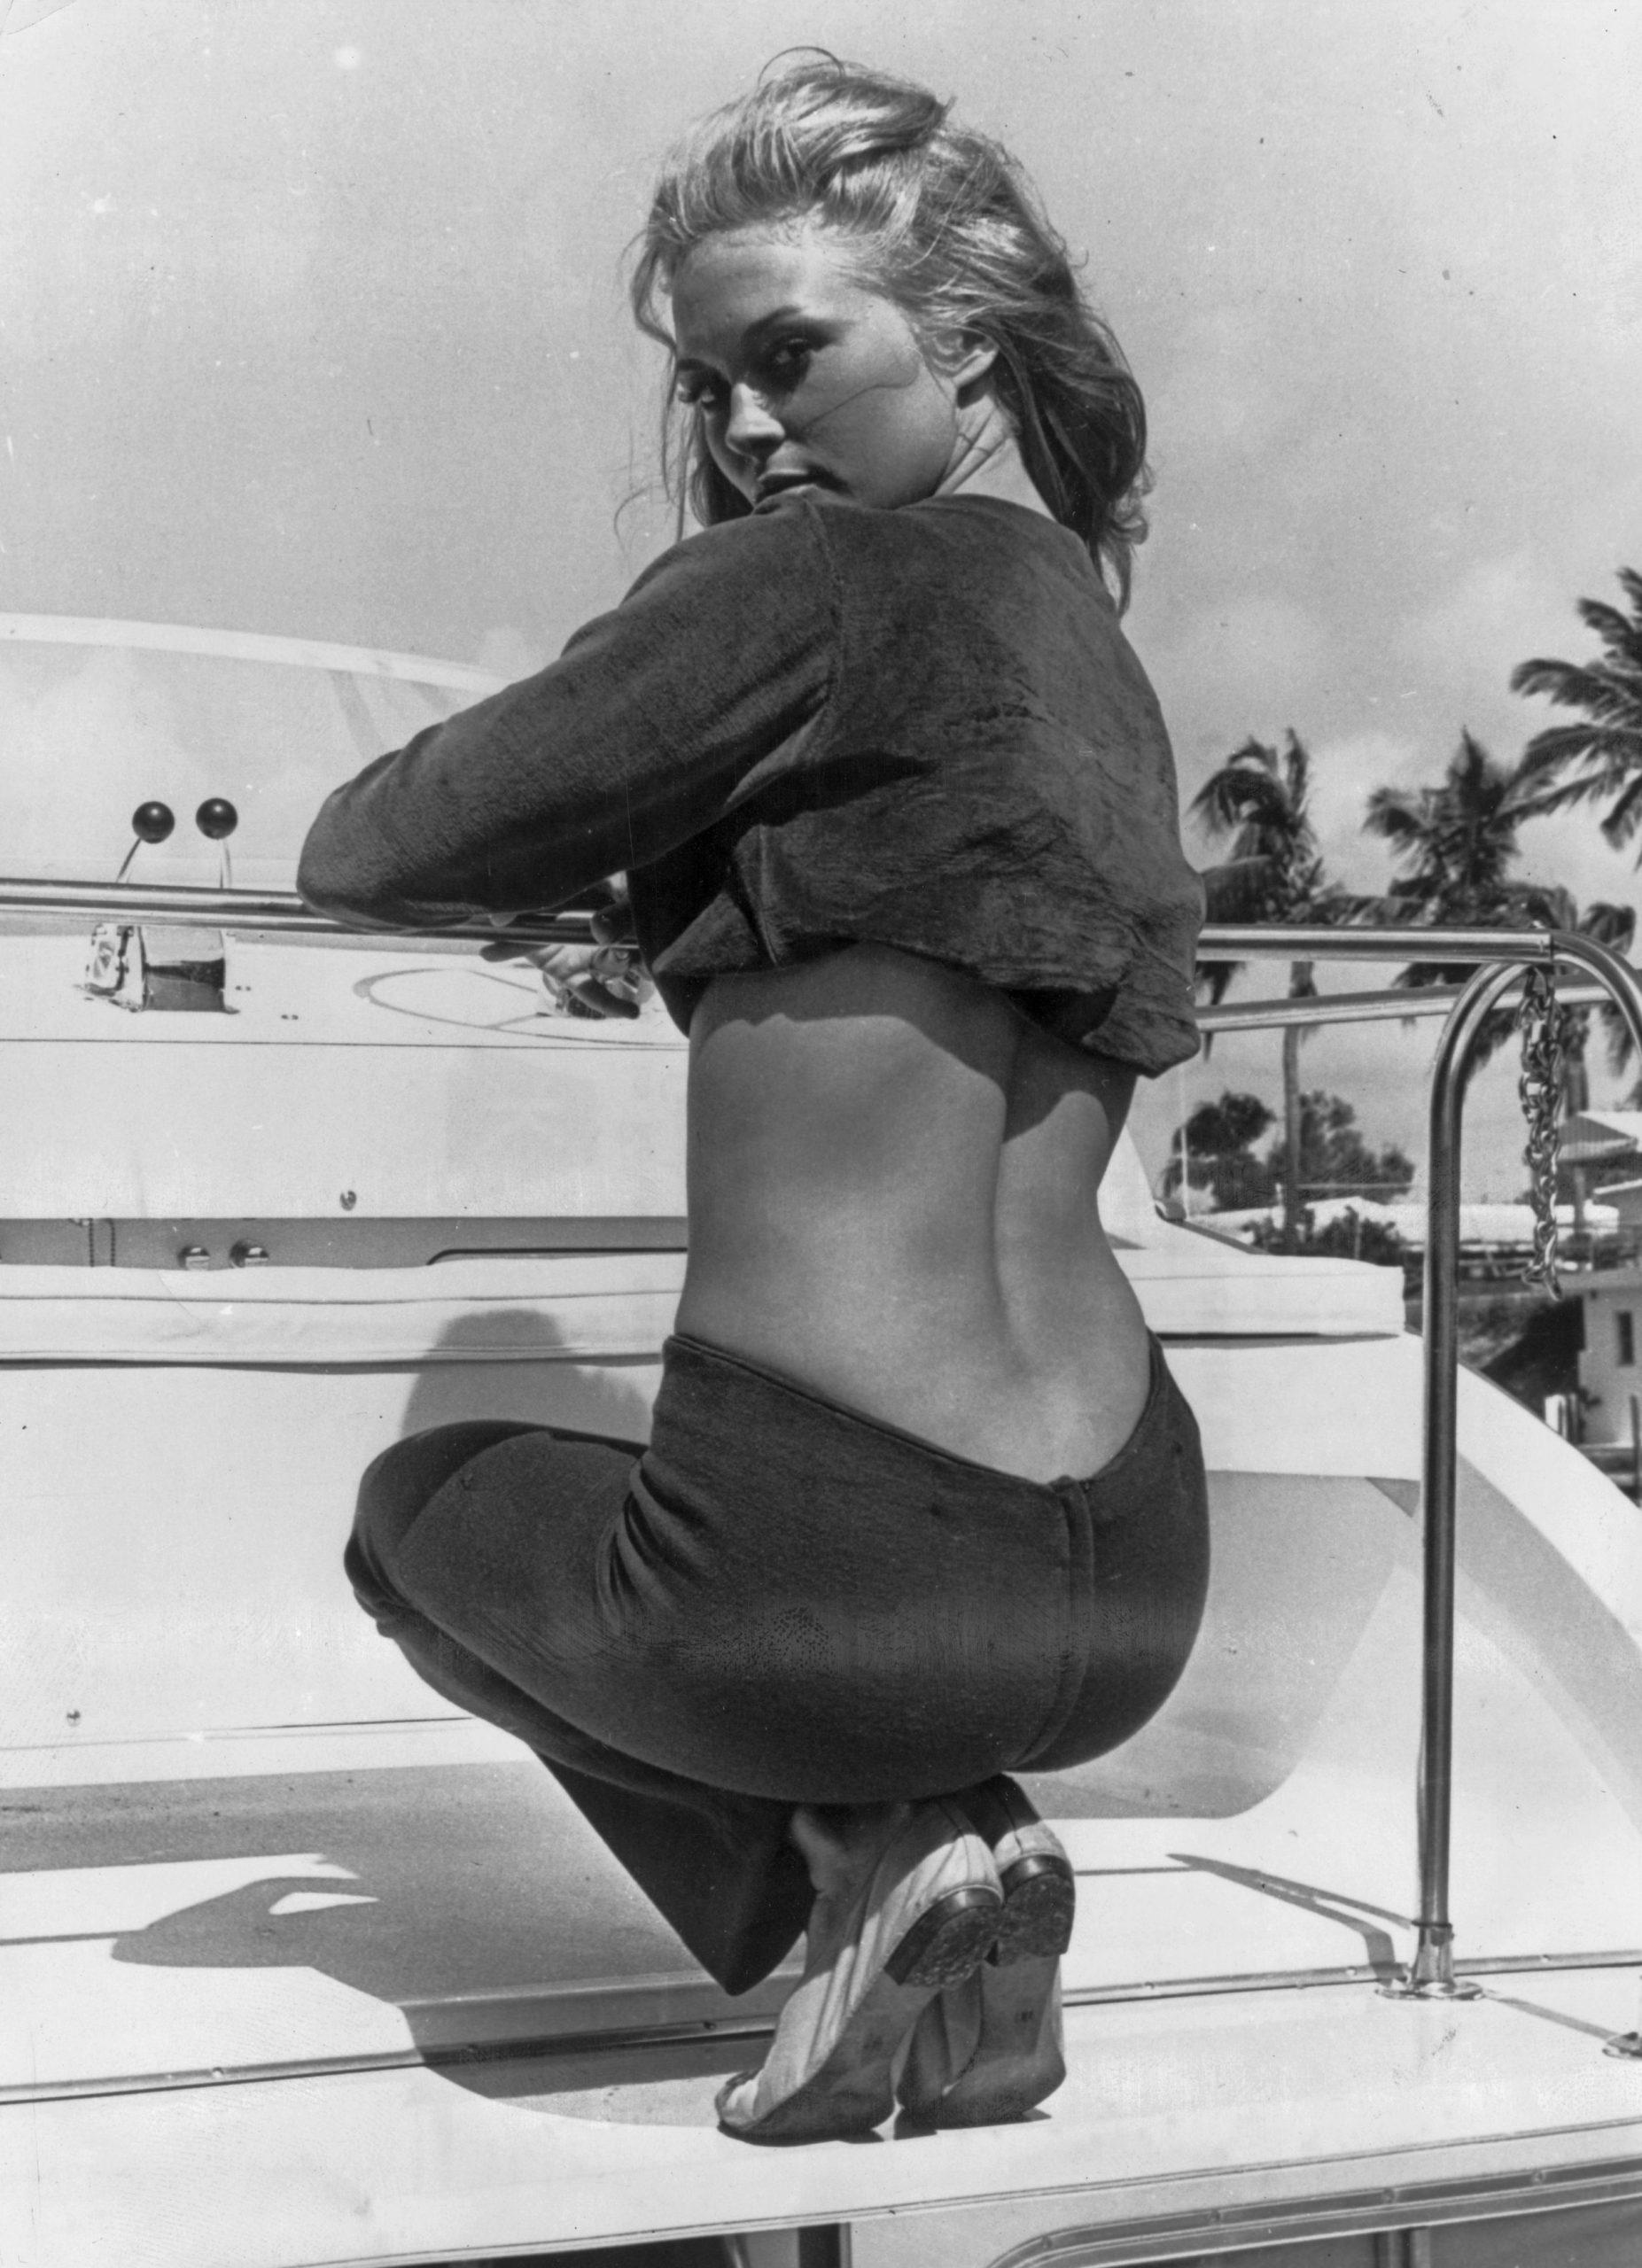 La actriz Faye Dunaway en 1967 / Foto: Getty Images